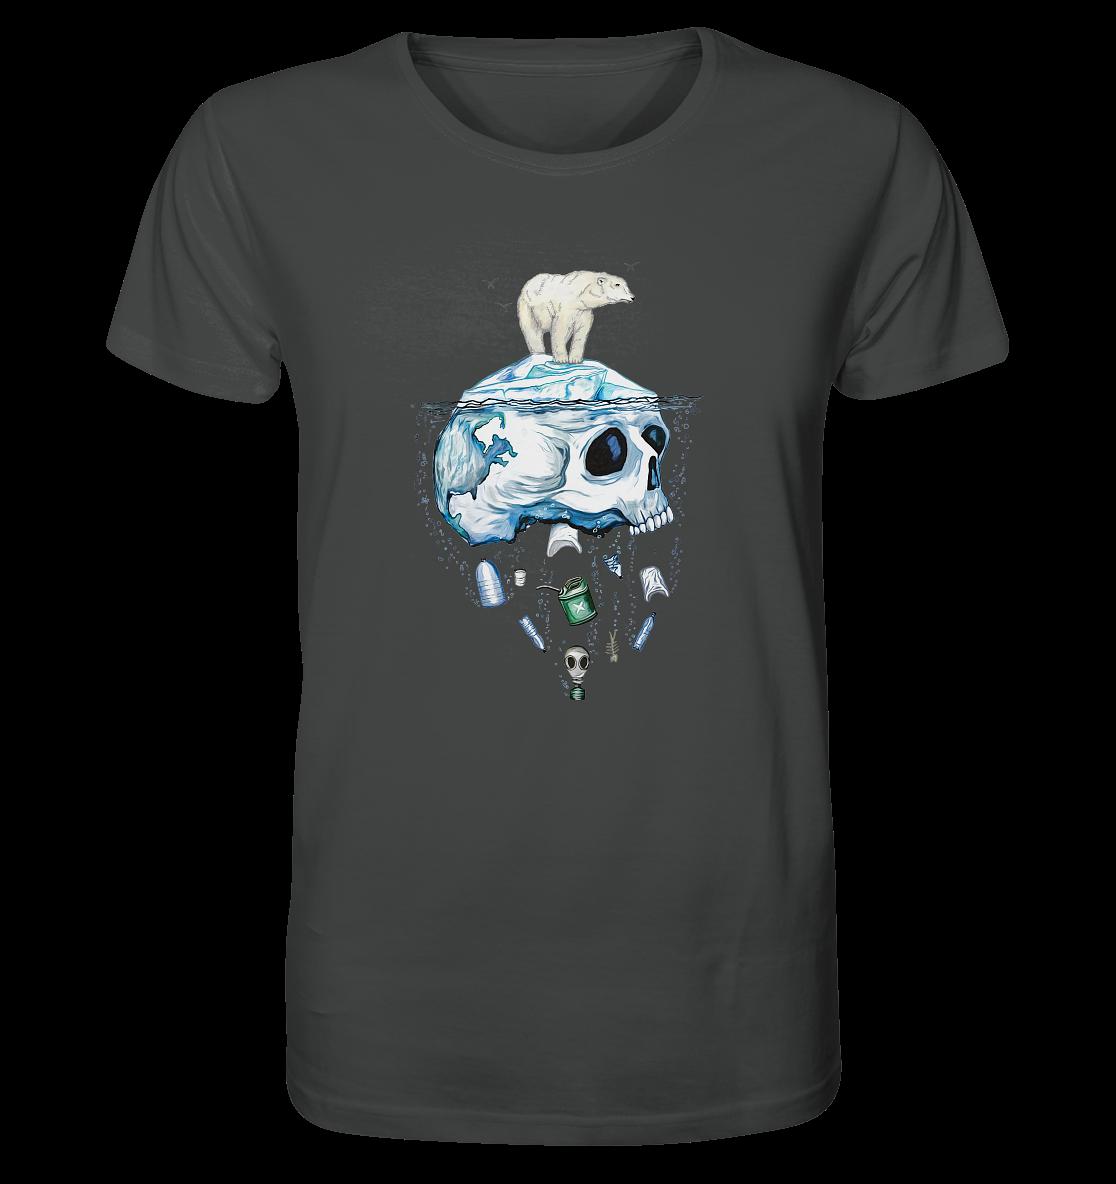 front-organic-shirt-444545-1116x.png